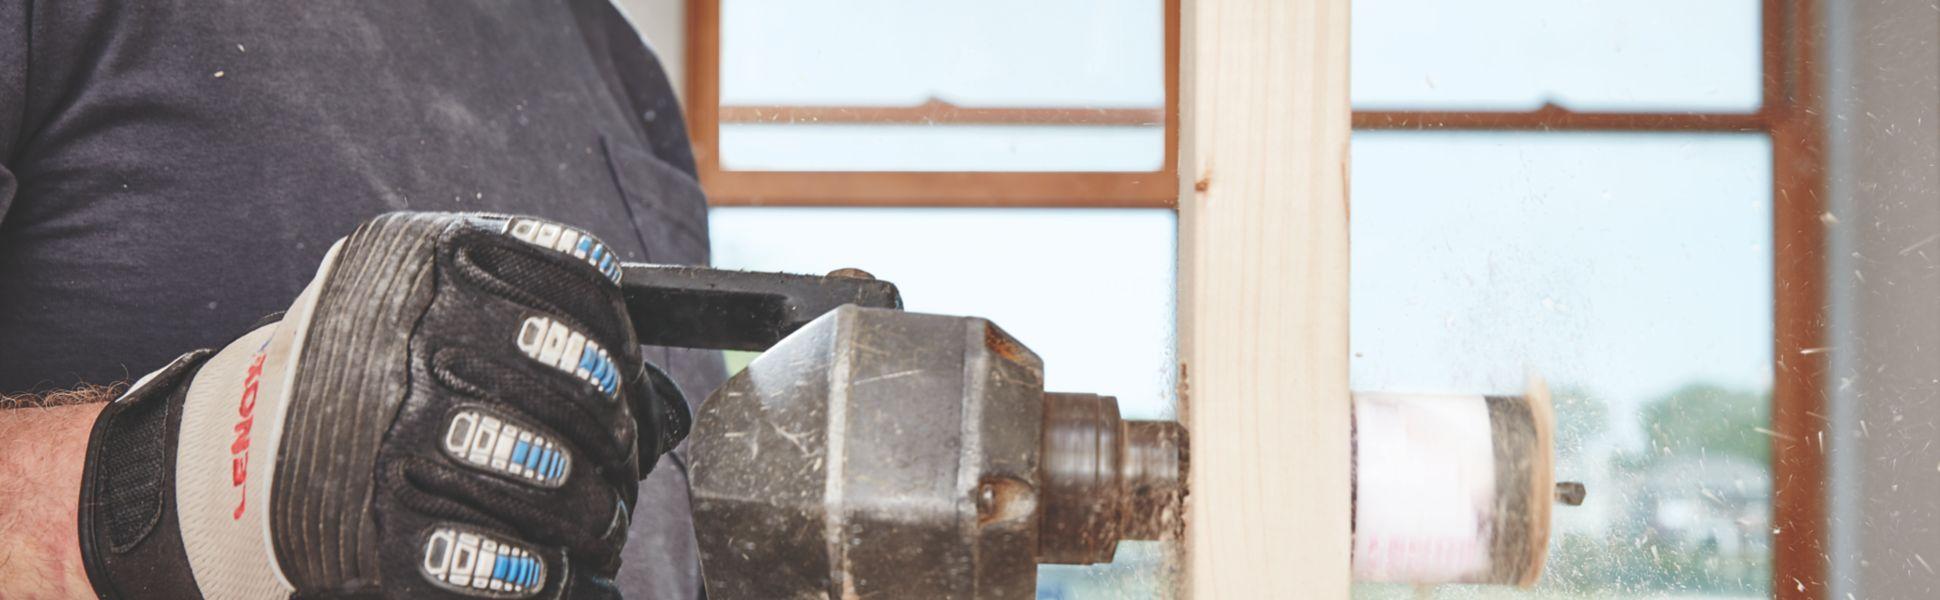 lenox tools bi metal speed slot hole saw set 9 piece kit 700g